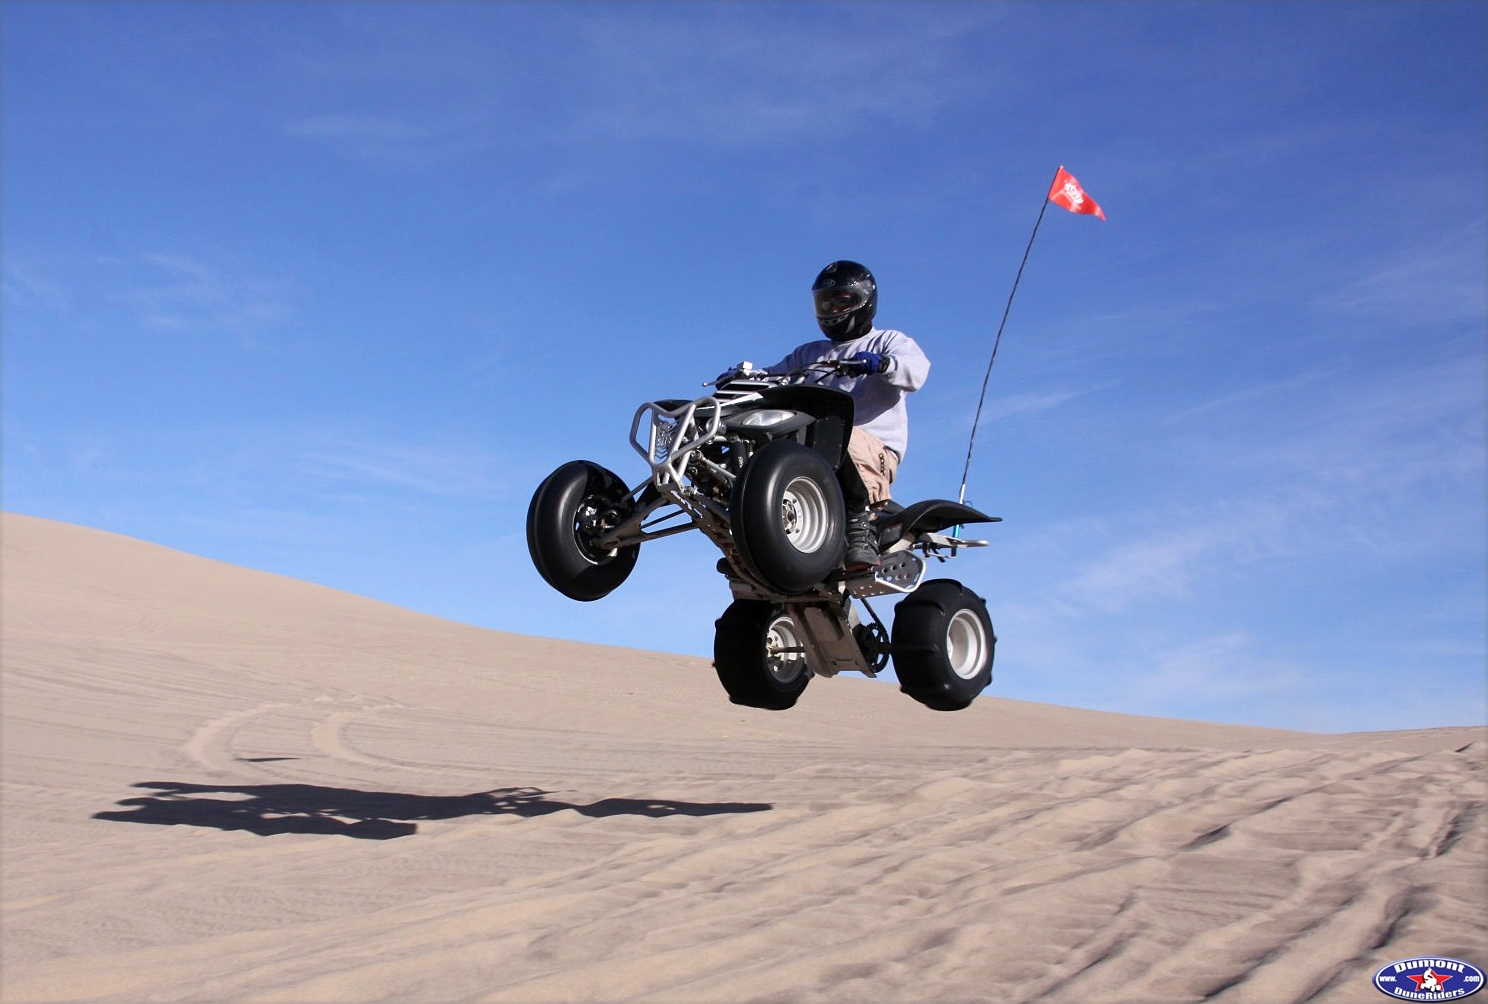 Sunday AM ride,Darrell jumping